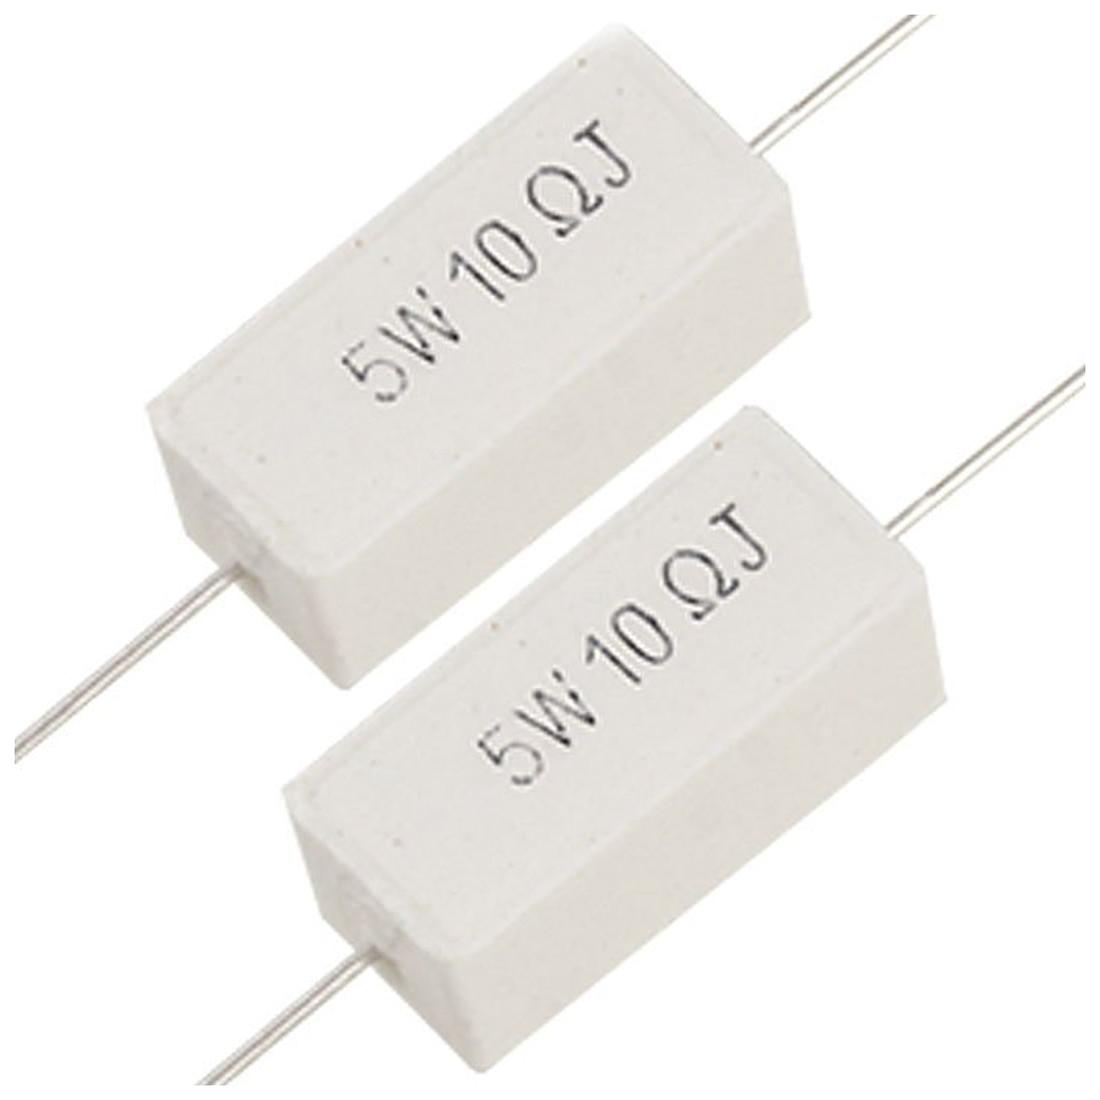 0.39 Ohm 2 Watt Power Axial Leads Carbon Film Resistors 30 Pcs